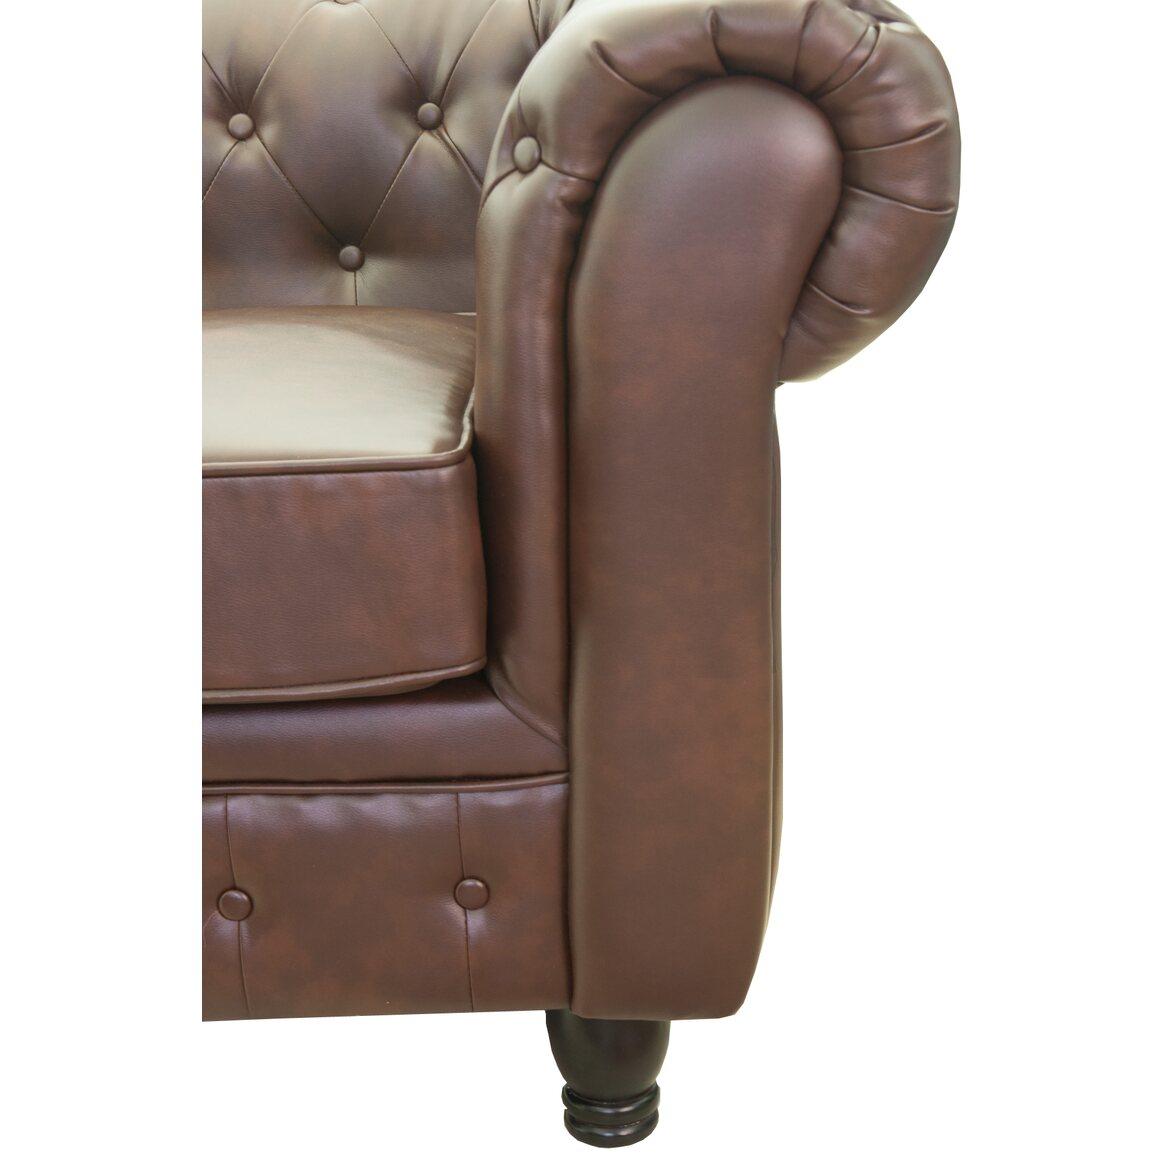 Кожаный трехместный диван Chesterfield brown 3S 2 | Прямые диваны Kingsby